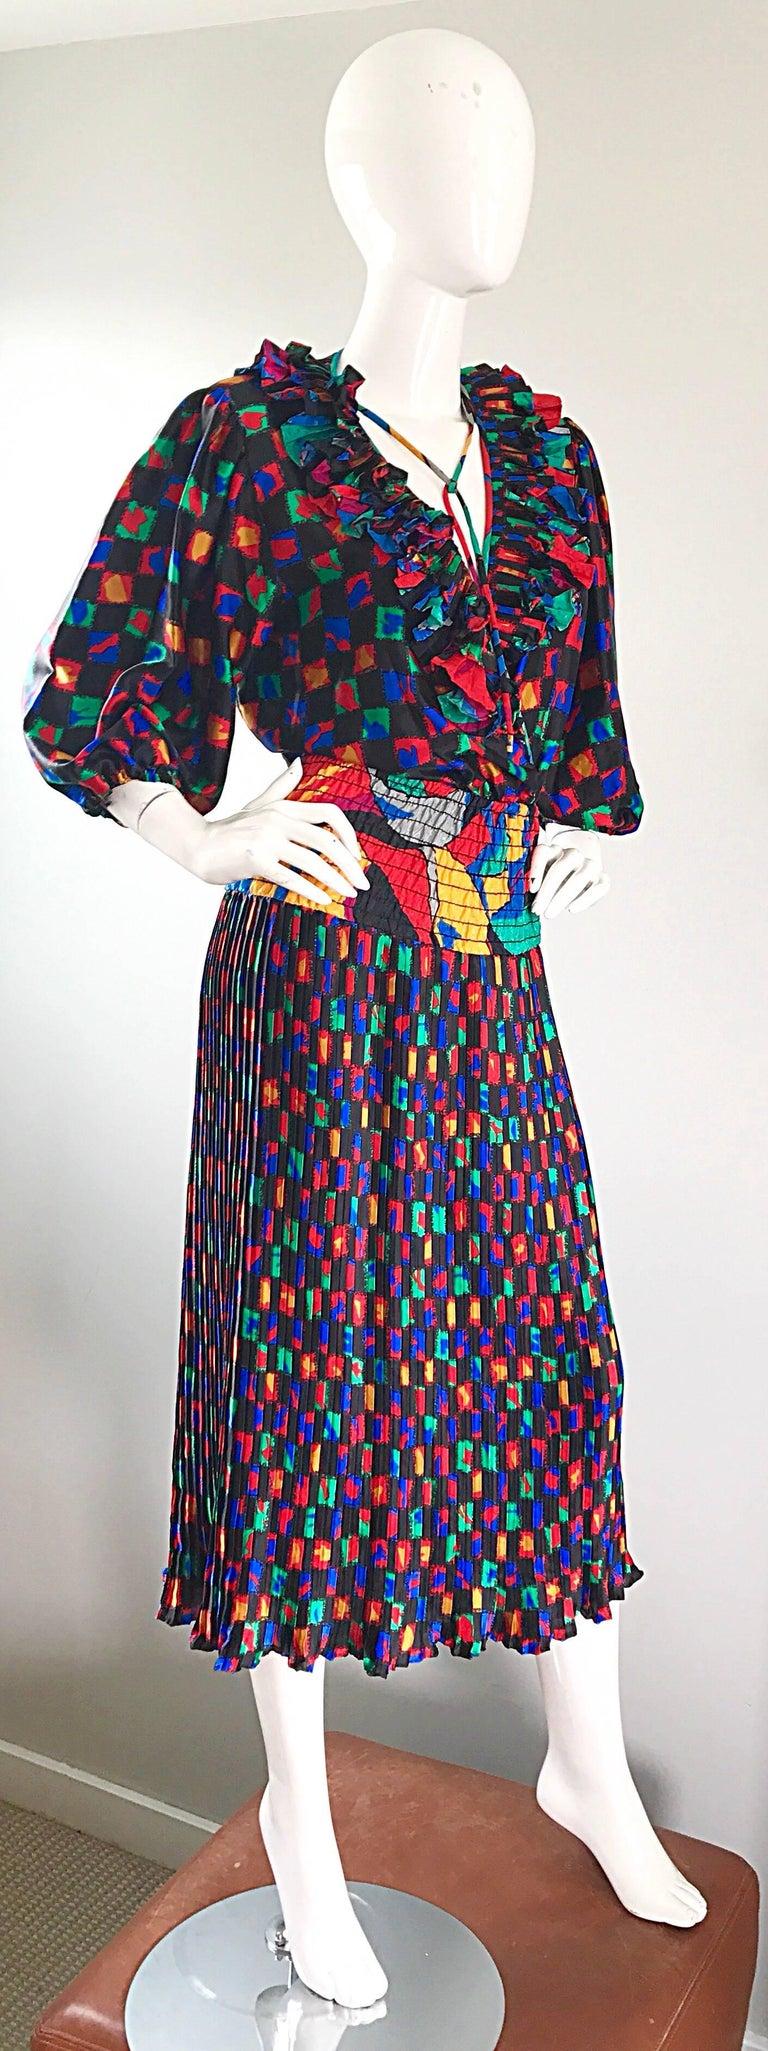 Diane Freis 1980s Colorful Mosaic Print Boho Ruffle Vintage 80s Midi Dress For Sale 3